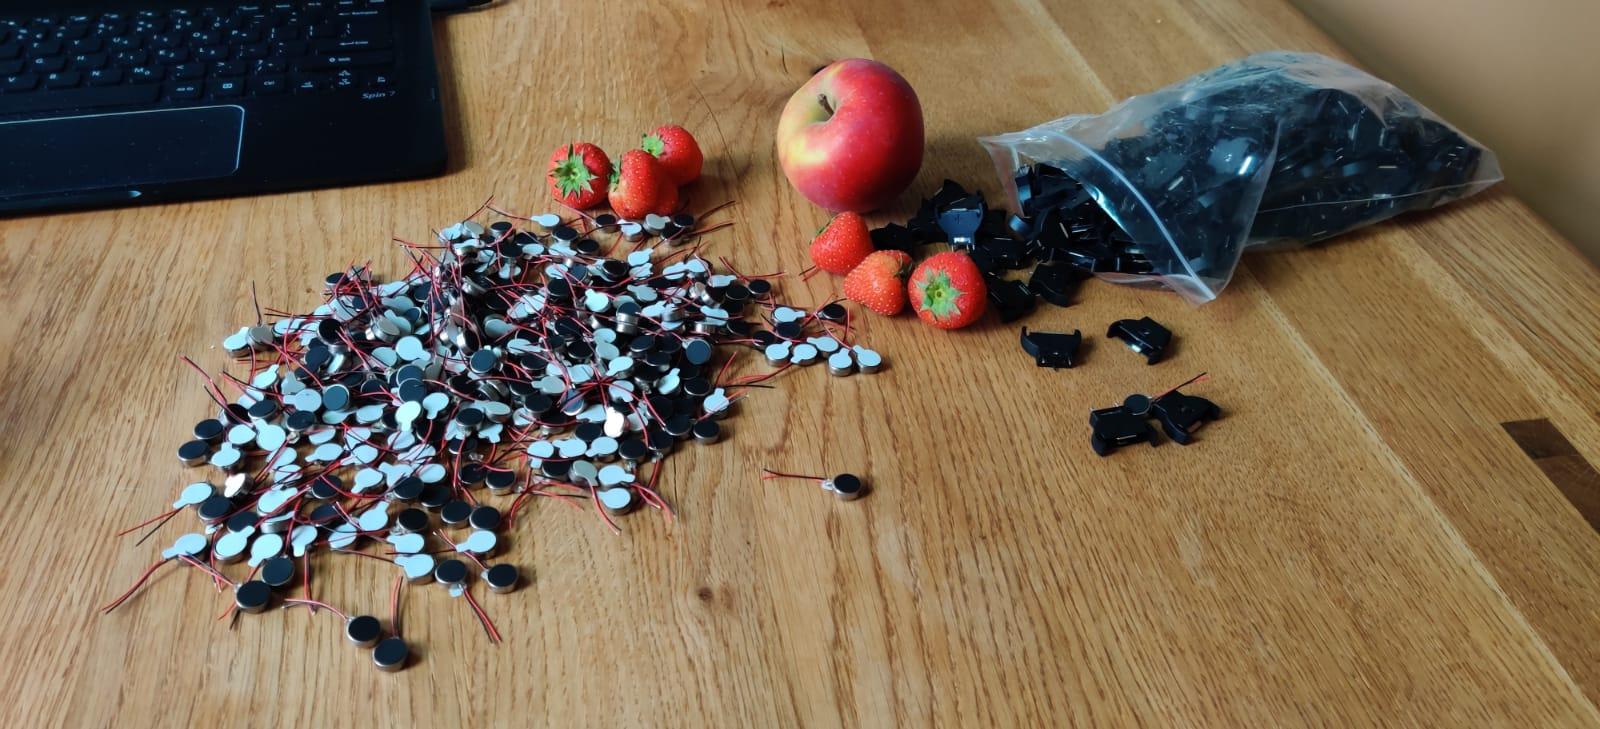 Shop – Junior IOT online – Thuiswerkset 5x trilrobot (3 oefeningen)